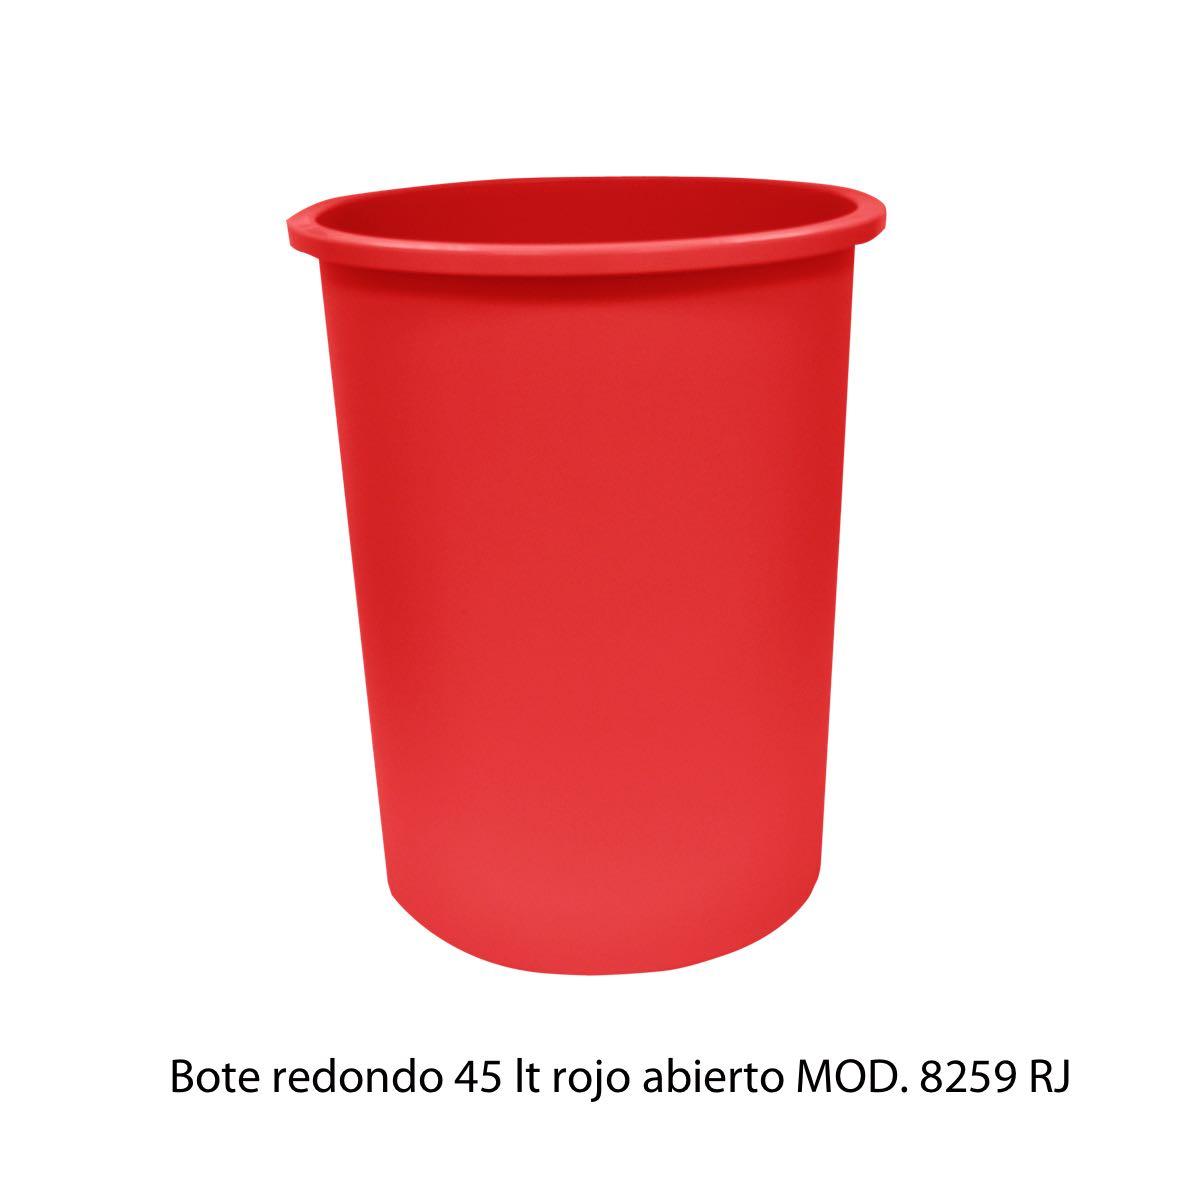 Bote de basura redondo de 45 litros sin tapa color rojo modelo 8259 RJ Sablón